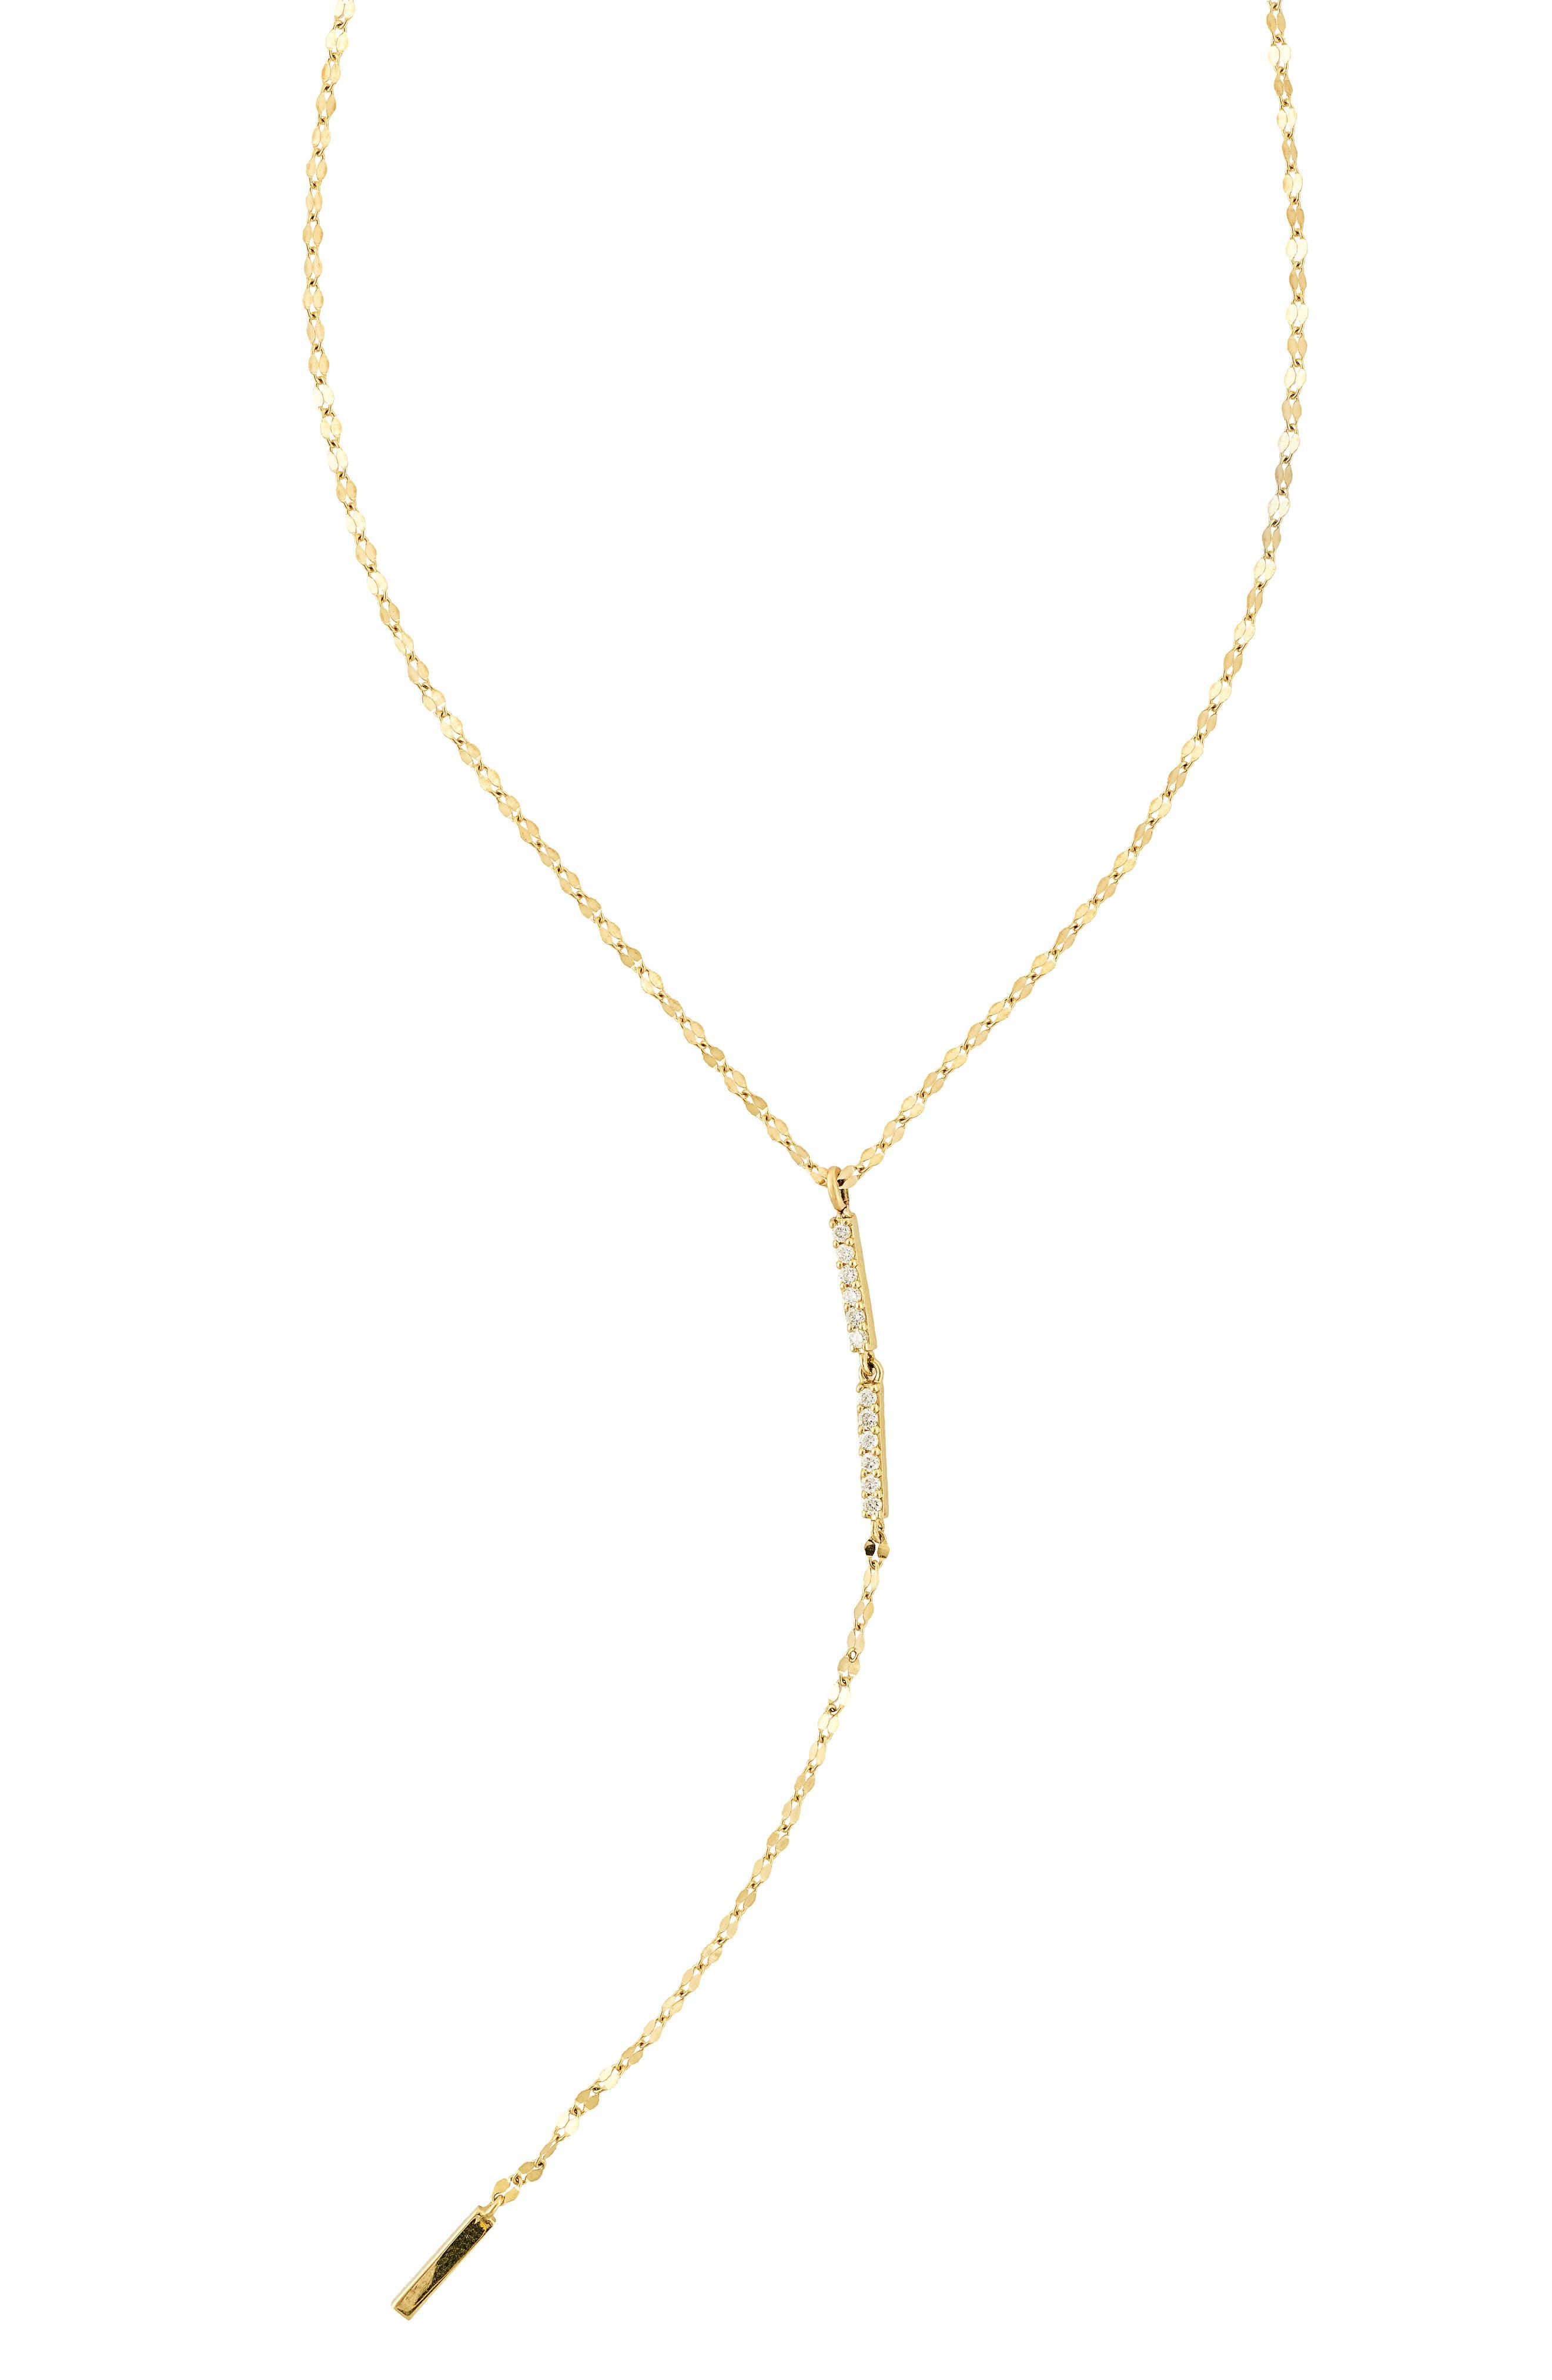 Diamond Bar Lariat Necklace,                             Main thumbnail 1, color,                             710